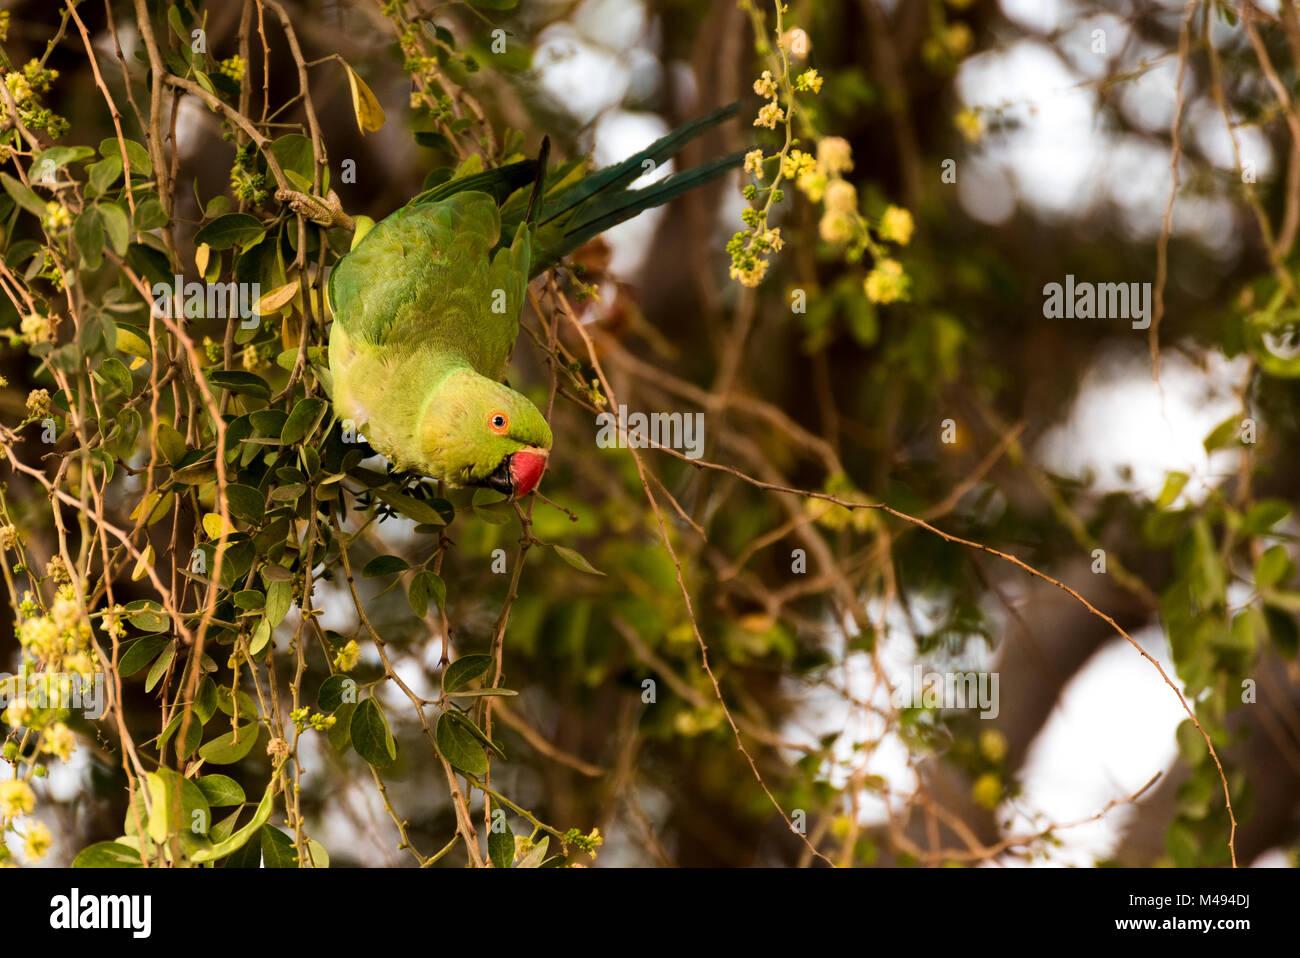 Rose-ringed parakeet female (parrot) swinging, eating on tamrind tree in Djibouti East Africa - Stock Image